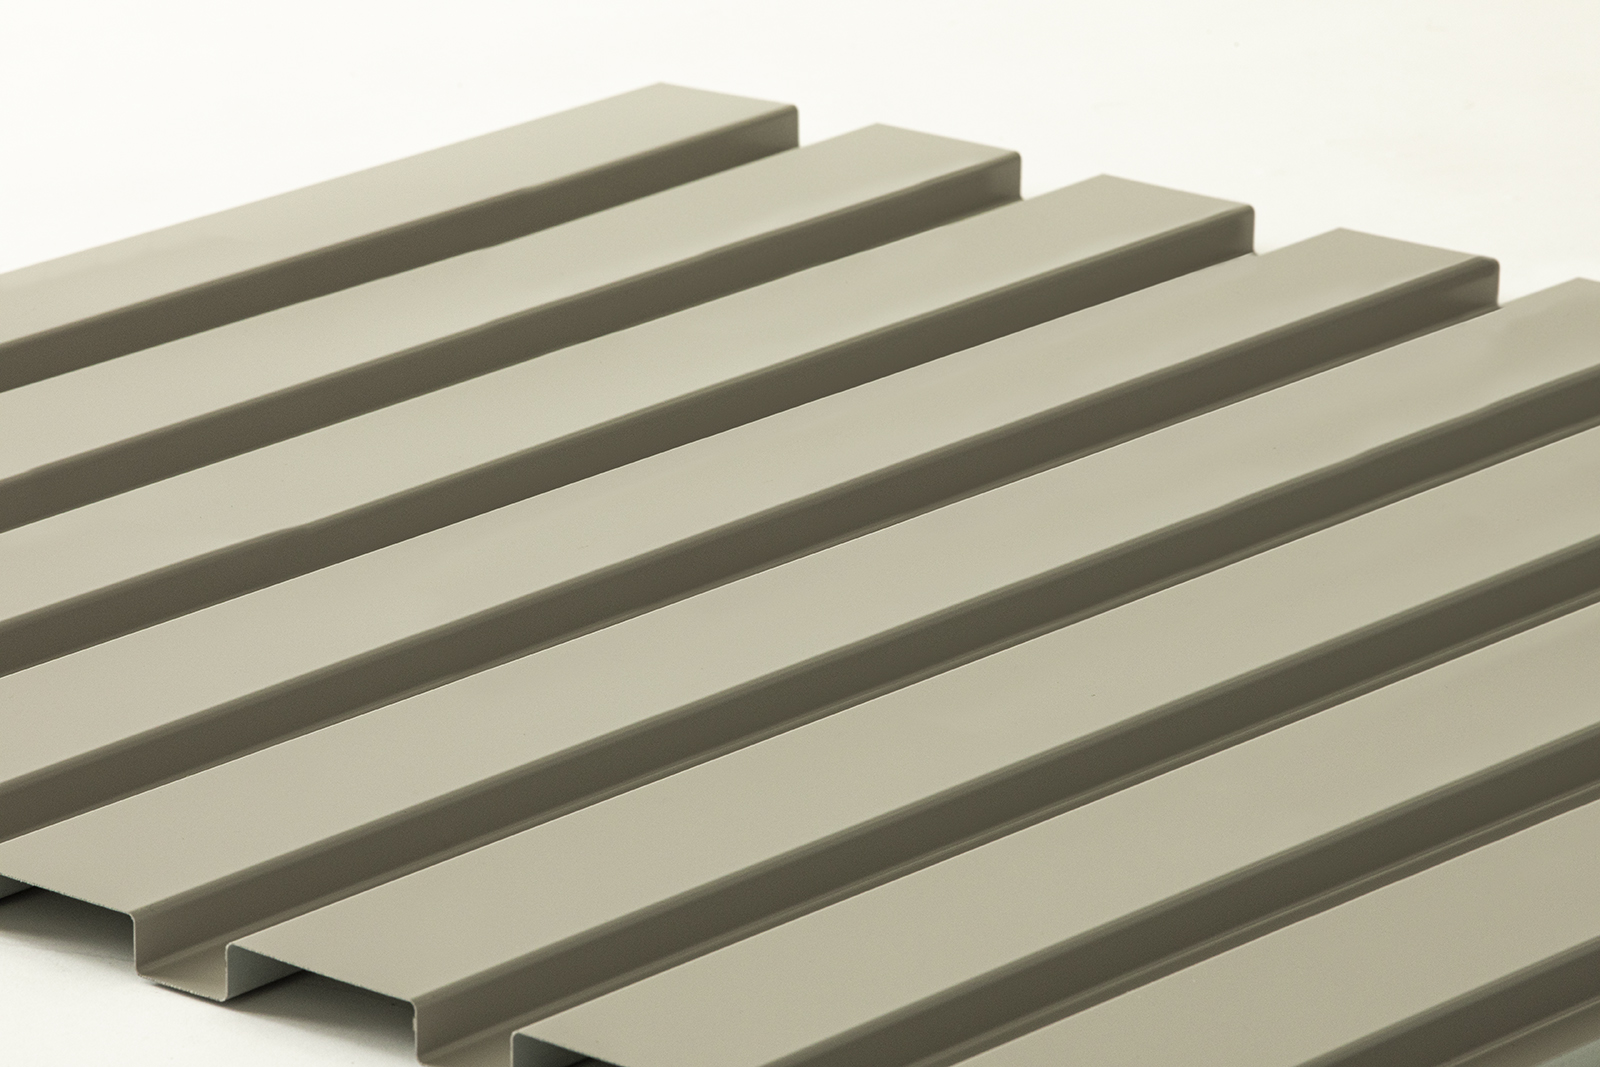 T16-E Metal Wall Panel Material